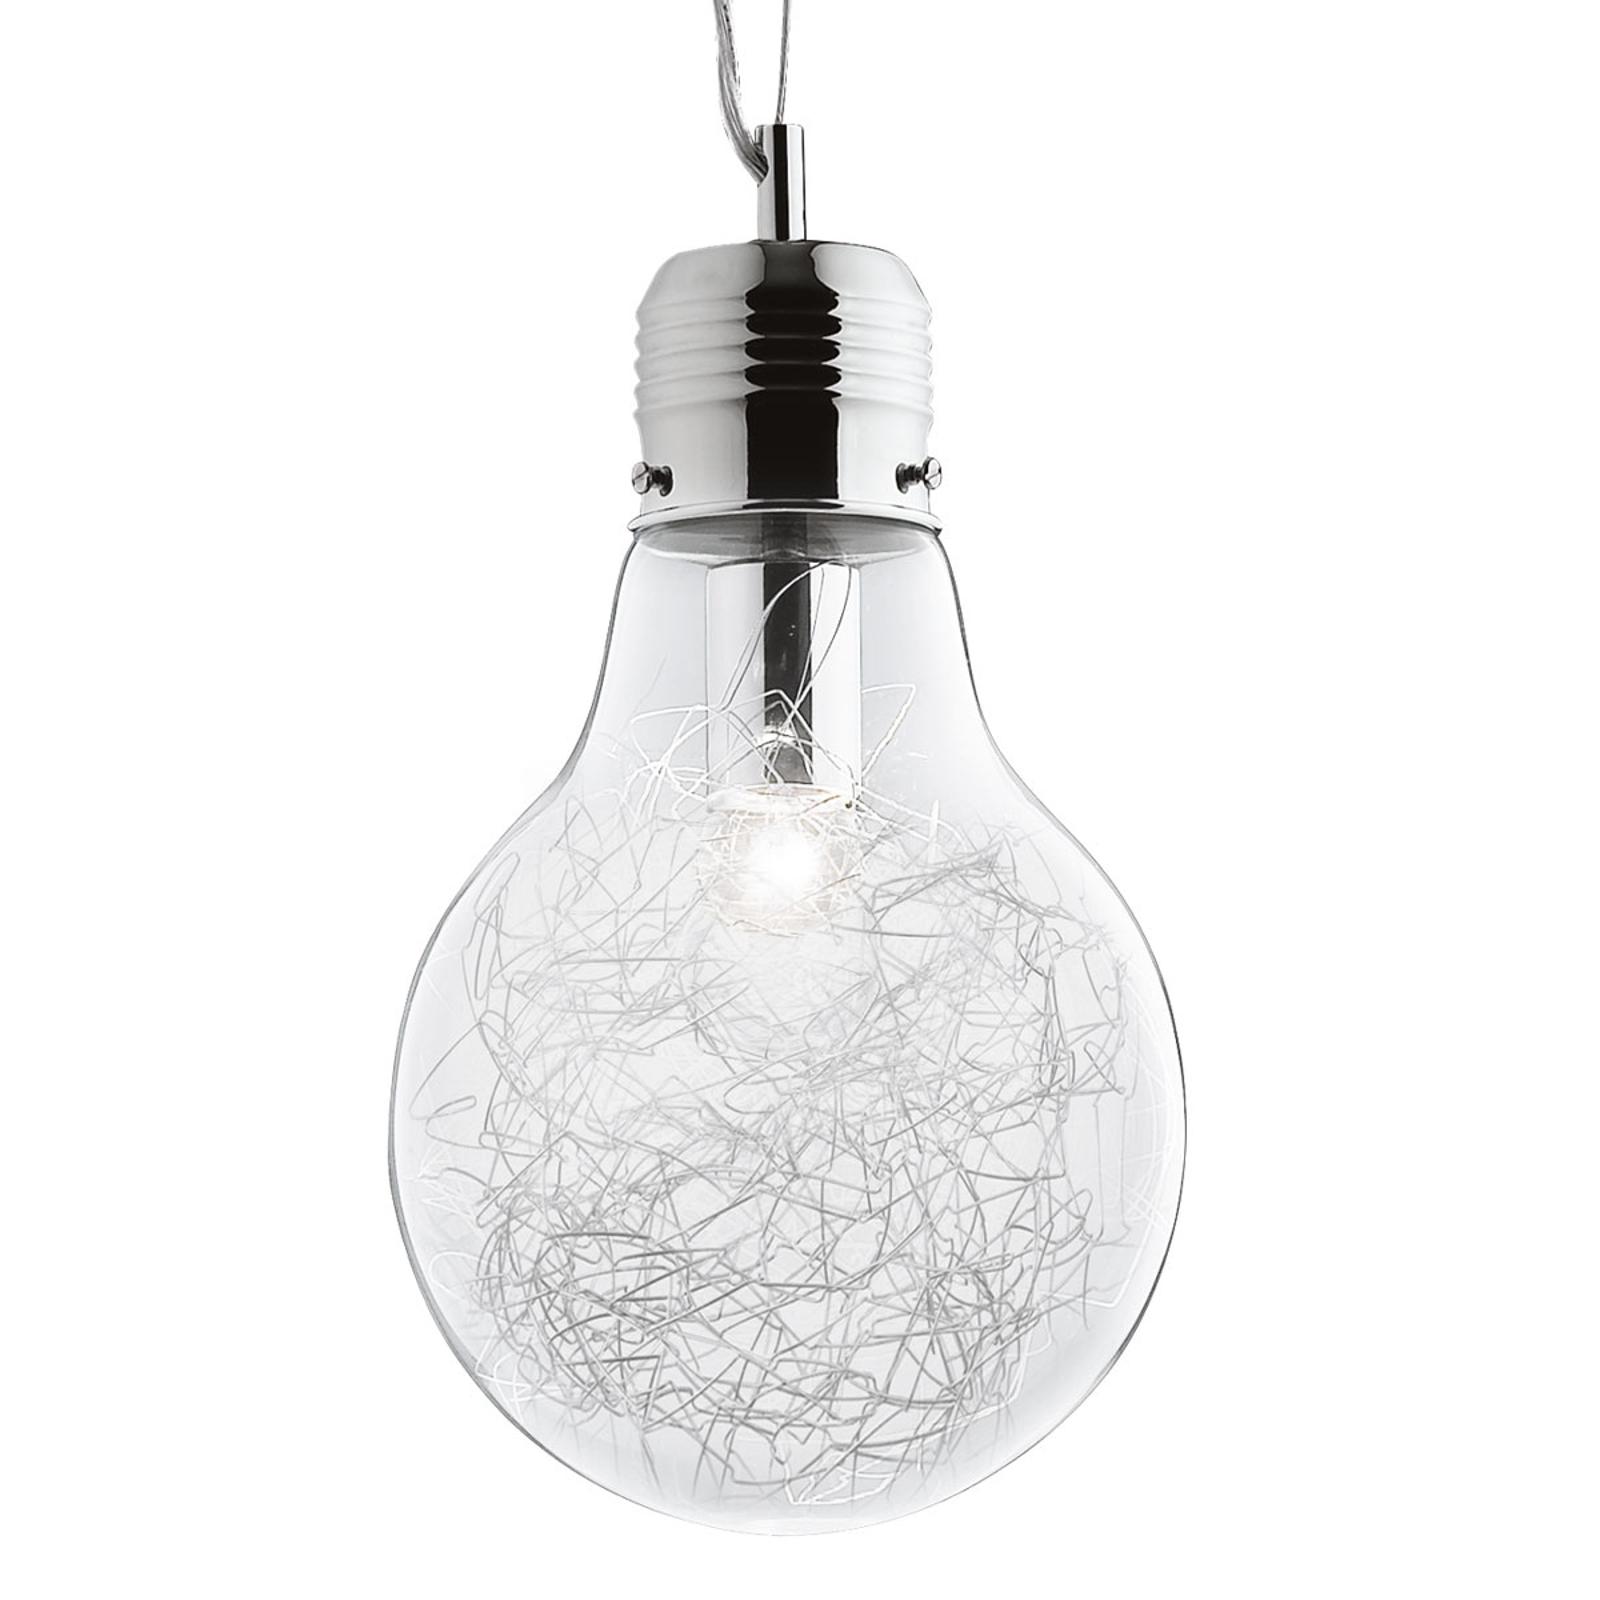 Luce Max - hanglamp in gloeilampvorm